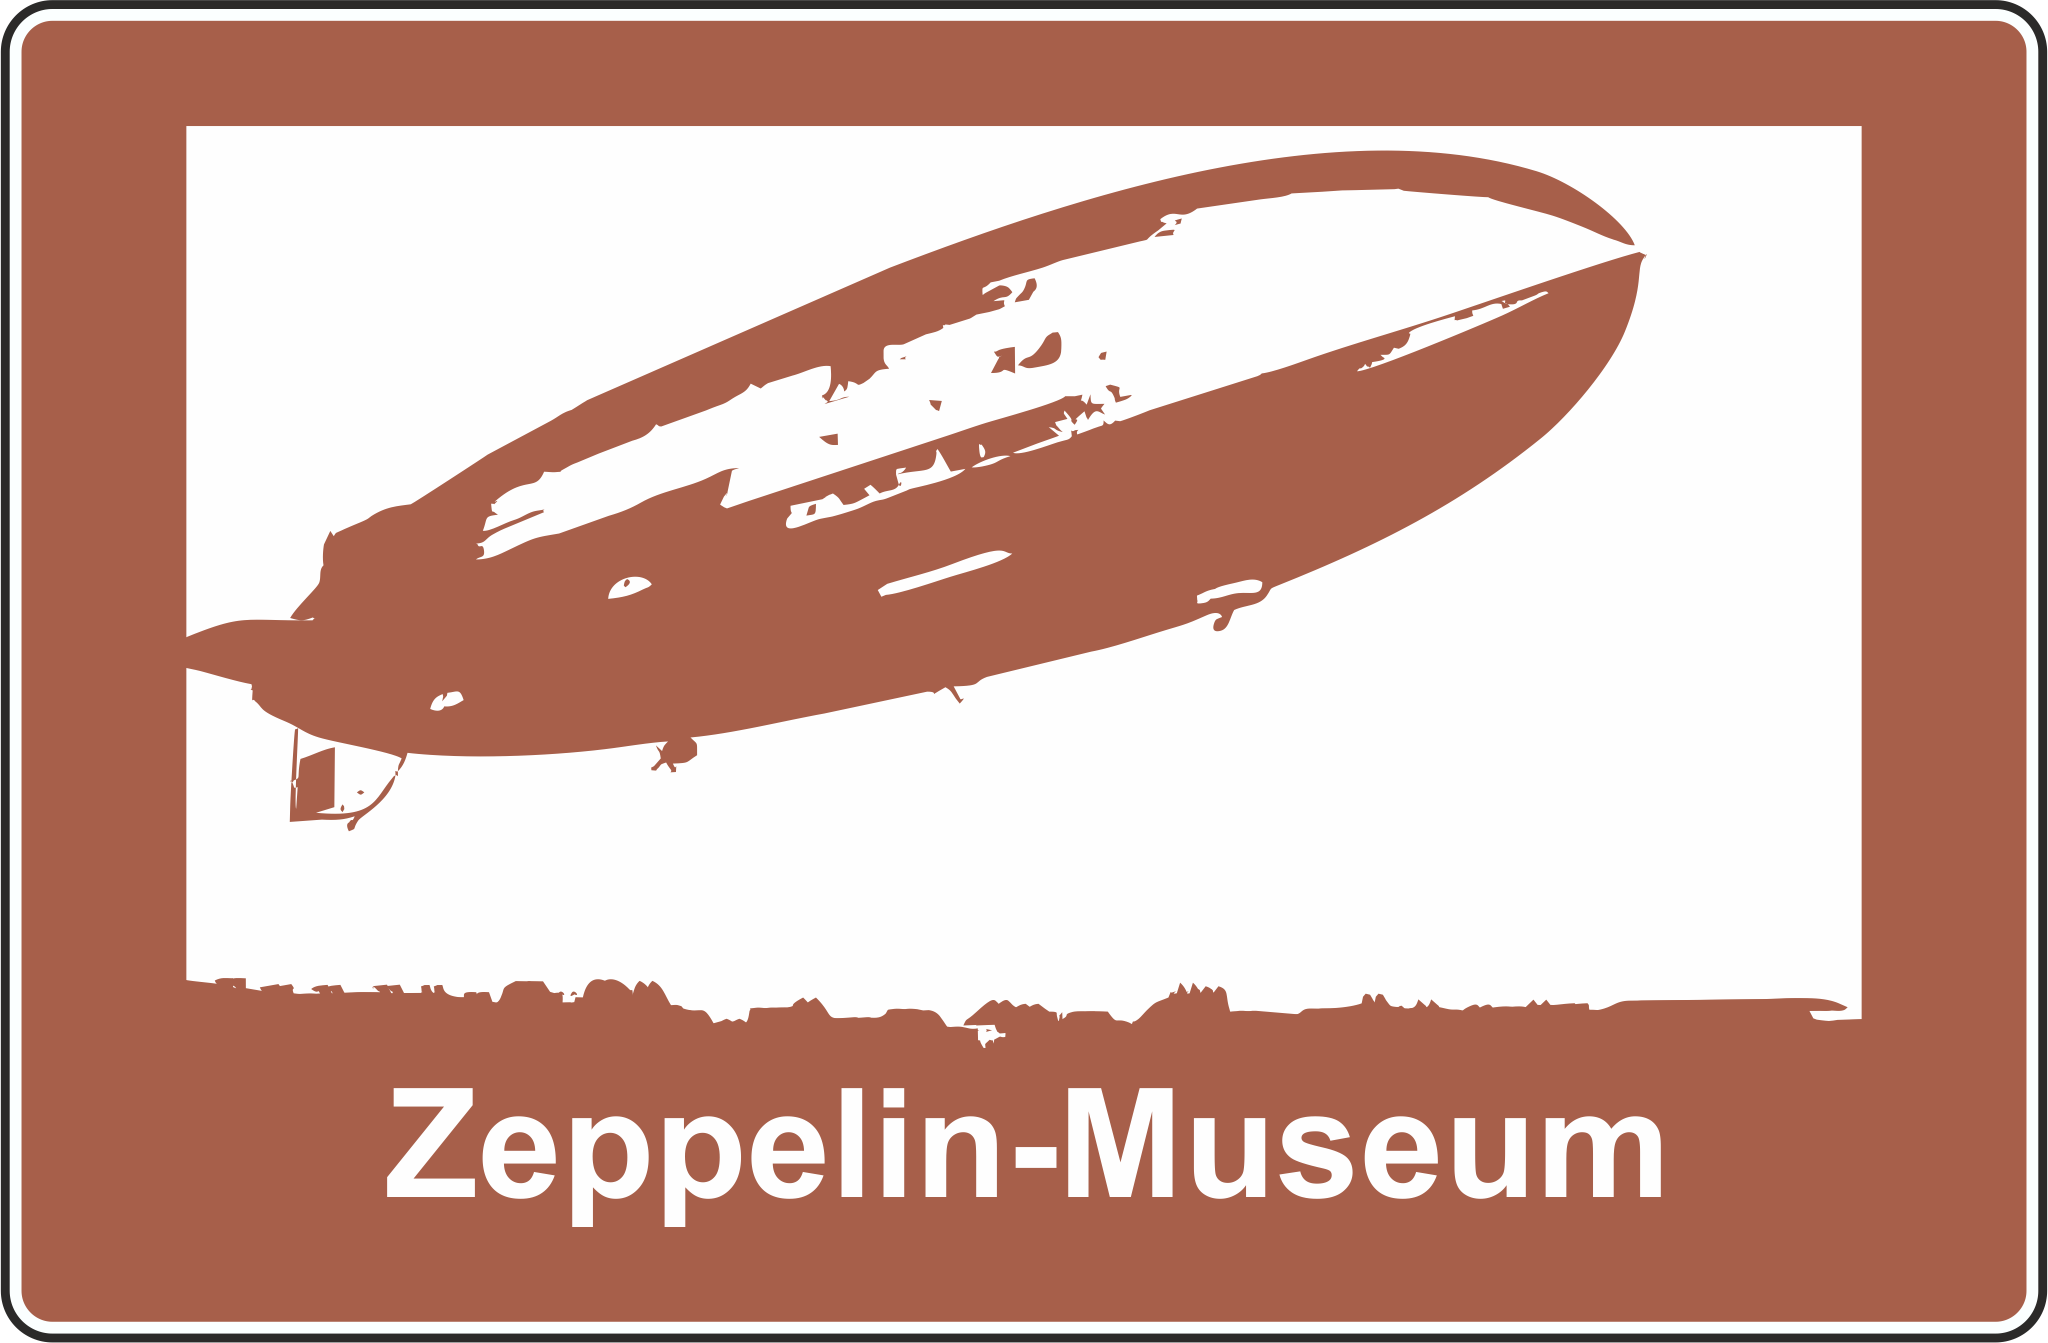 Autobahn-Hinweistafel Zeppelin-Museum © www.alexander-jungmann.de 2016